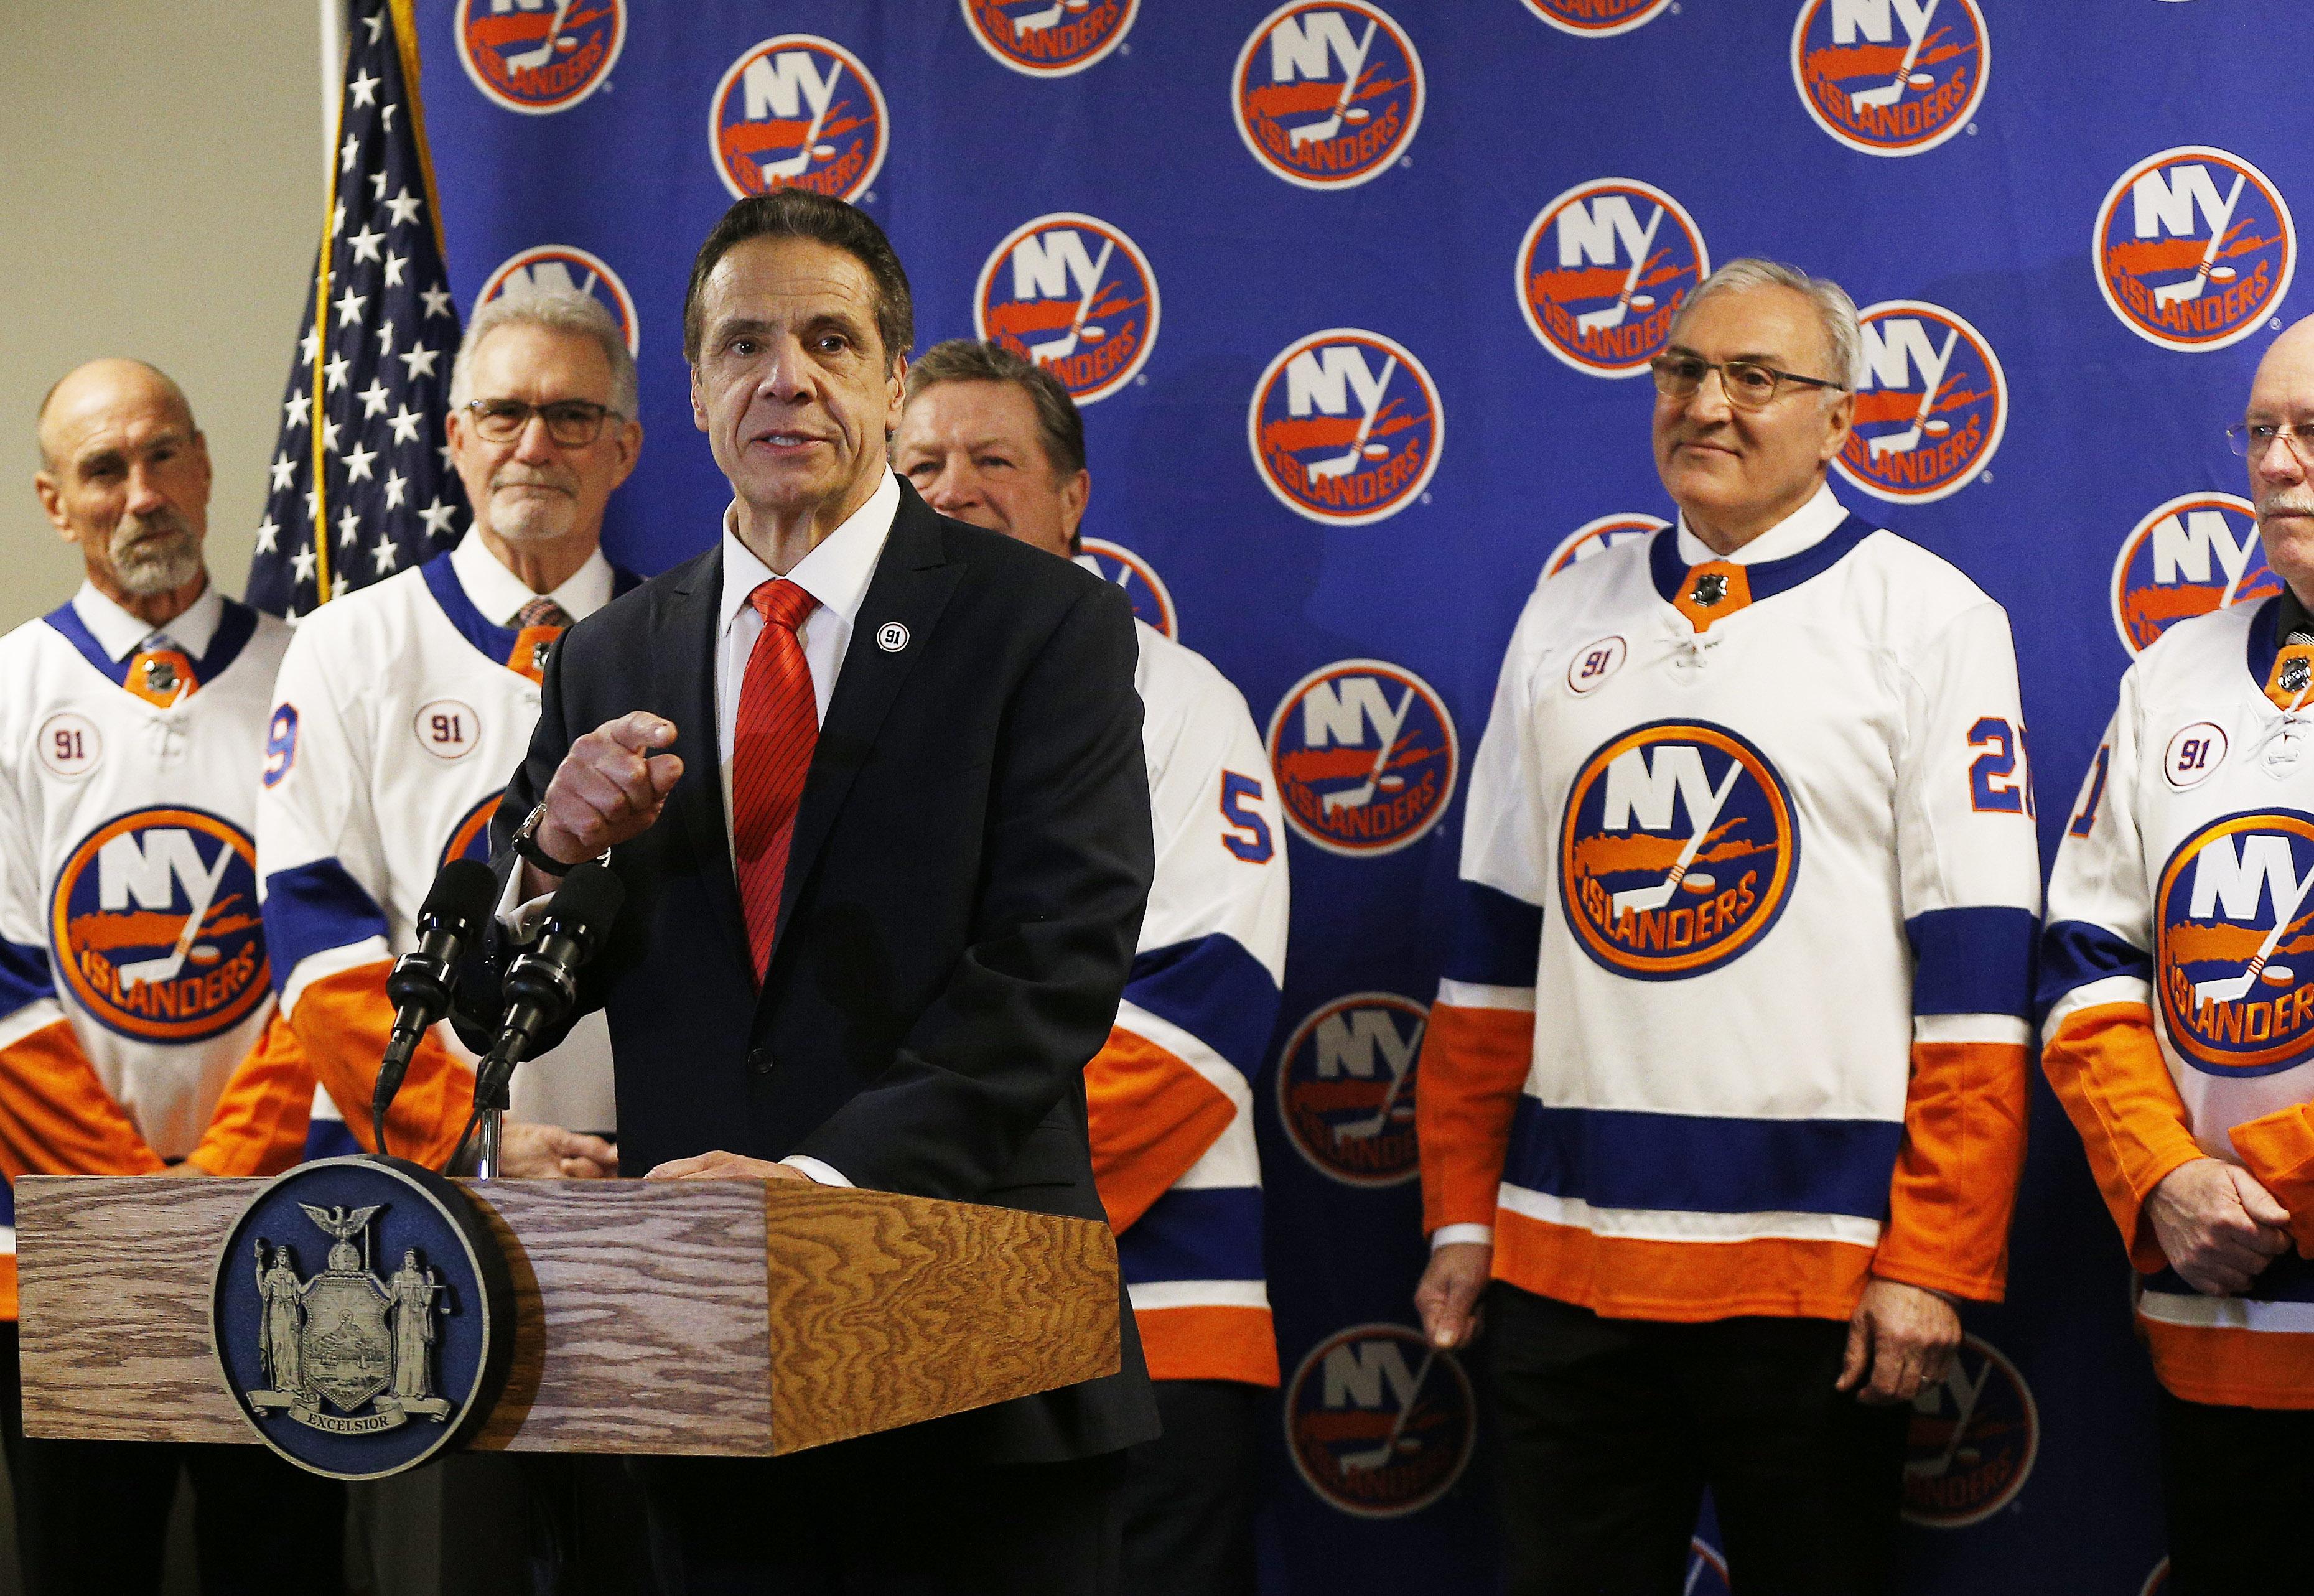 Islanders to return to Long Island full time next season